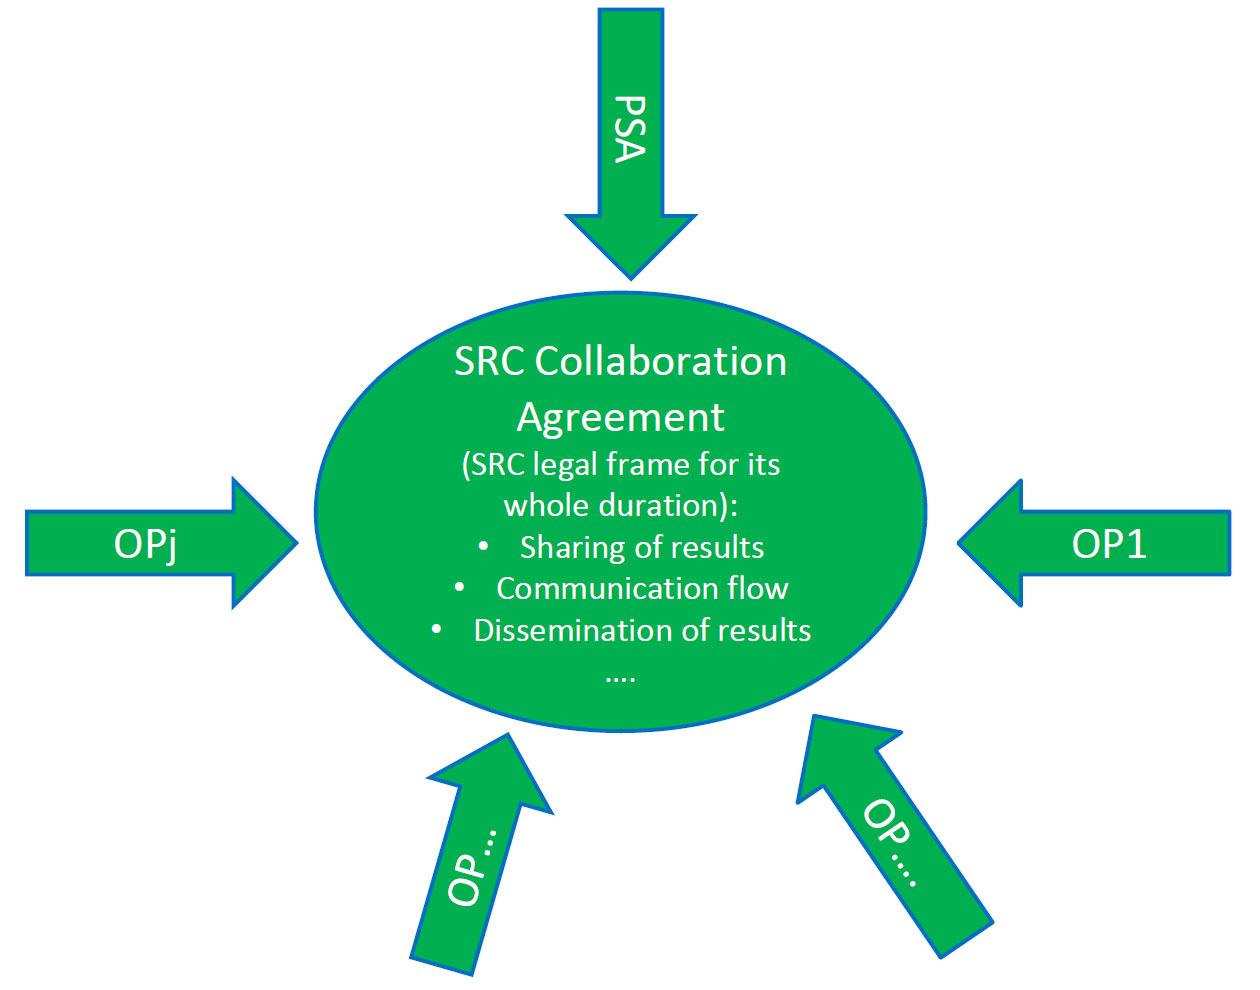 src_collaboration